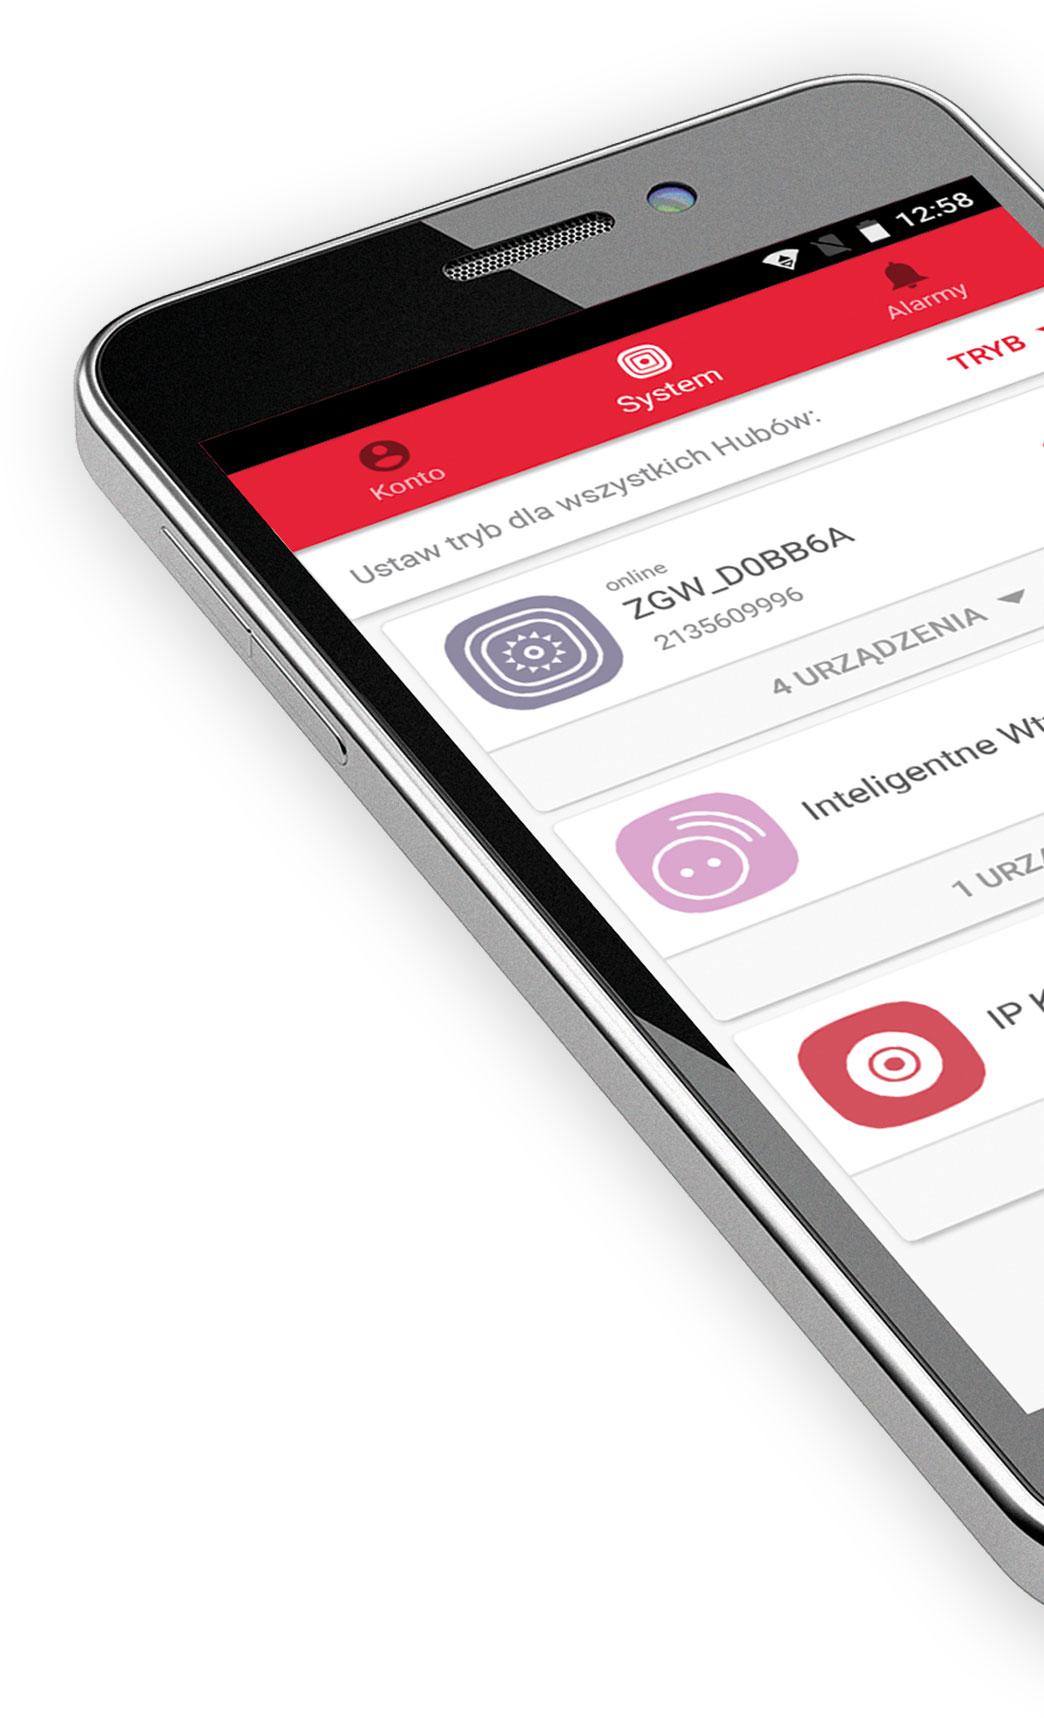 Ferguson Smart Home Mobile Application